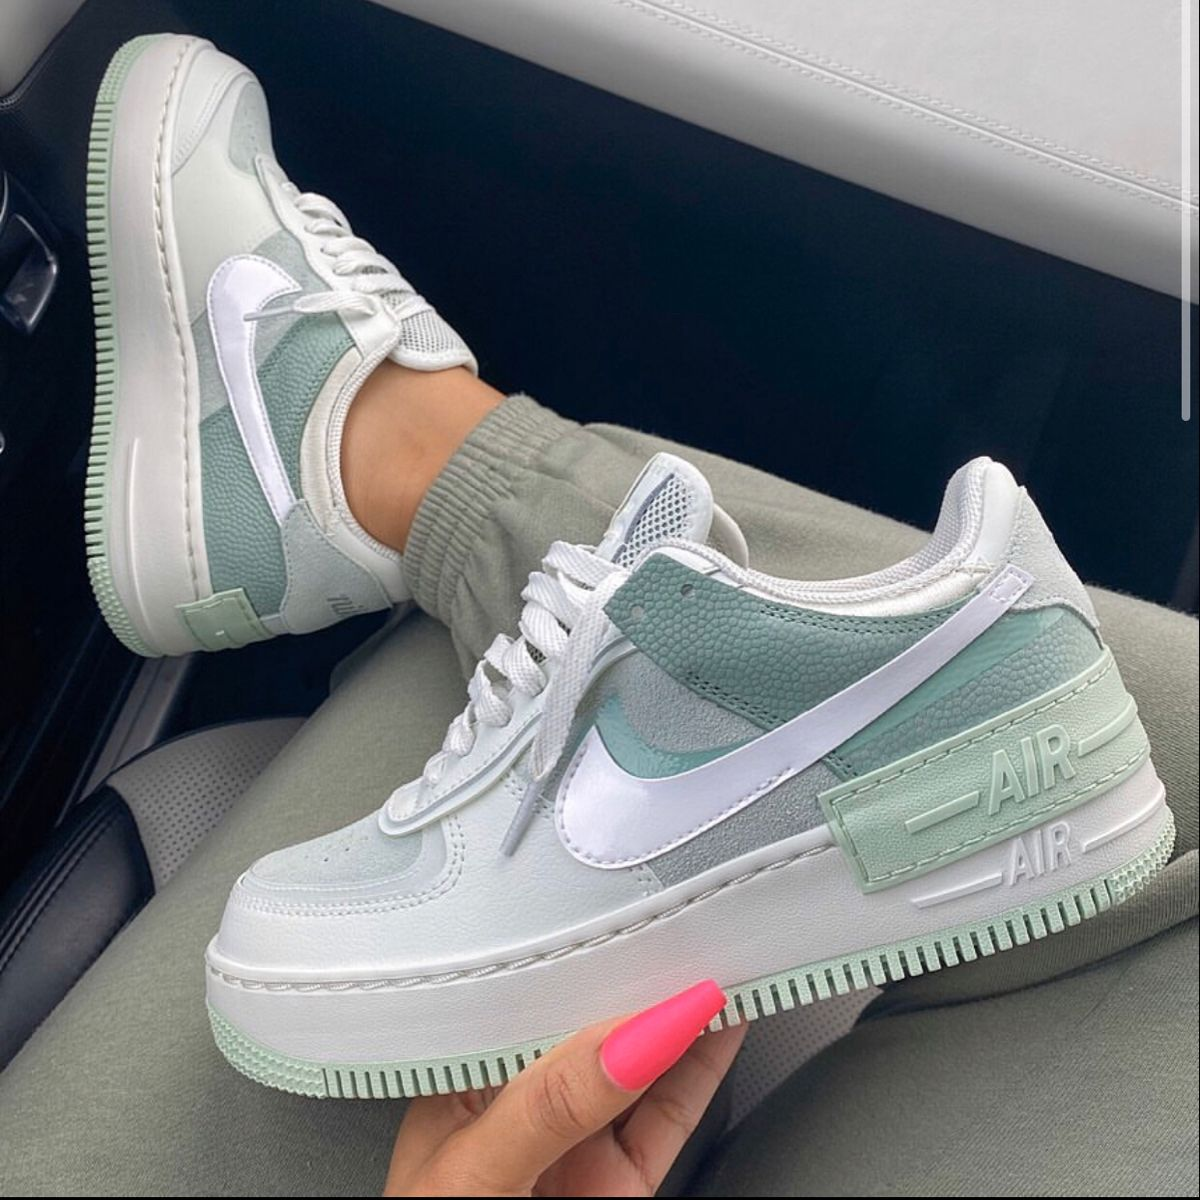 Nike Air Shadow Mint Green In 2020 Nike Shoes Air Force Jordan Shoes Girls Fresh Shoes